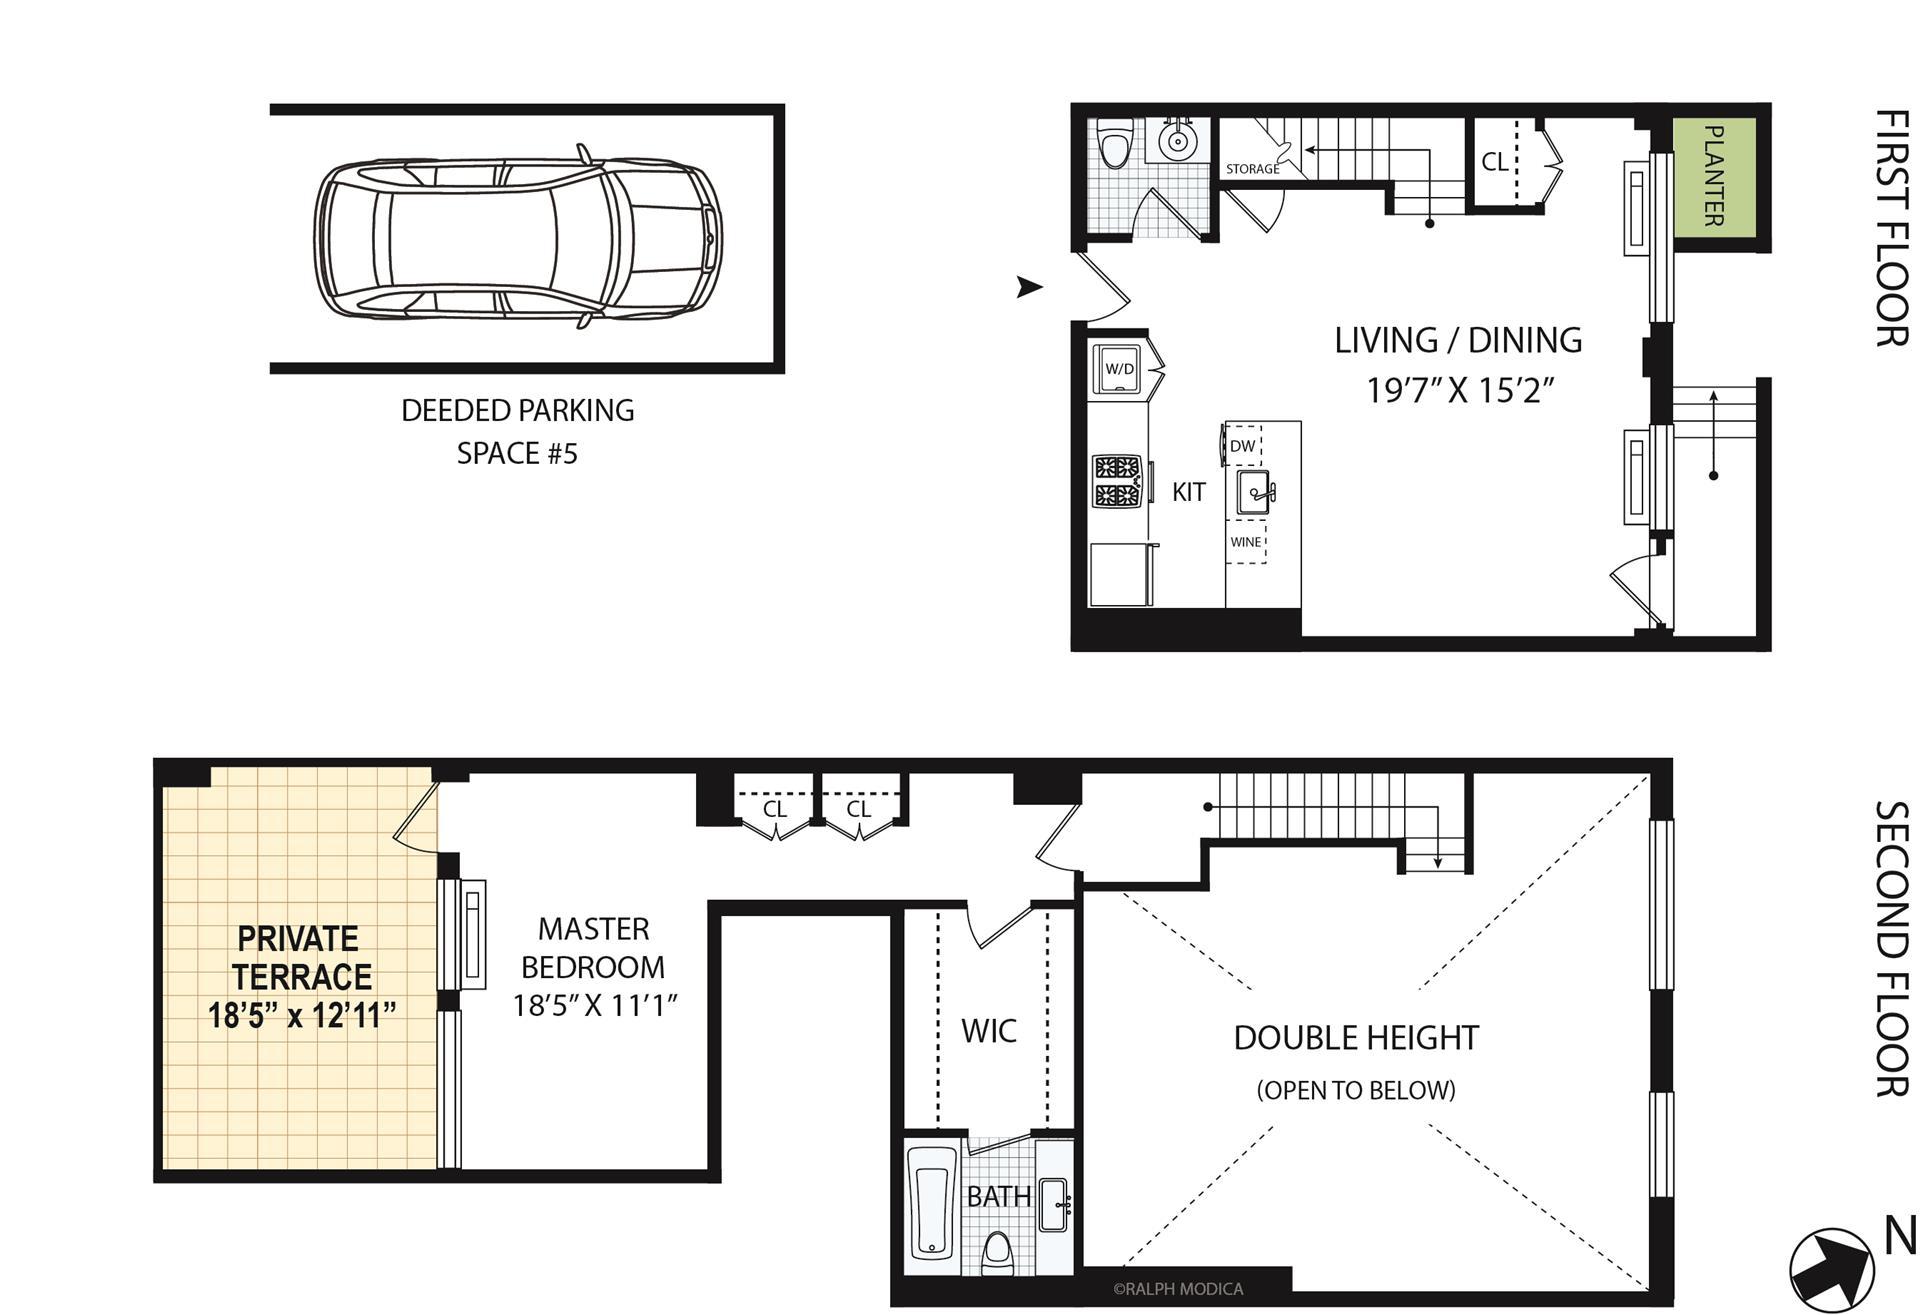 Floor plan of 2-40 51st Avenue, TH1C - Long Island City, New York